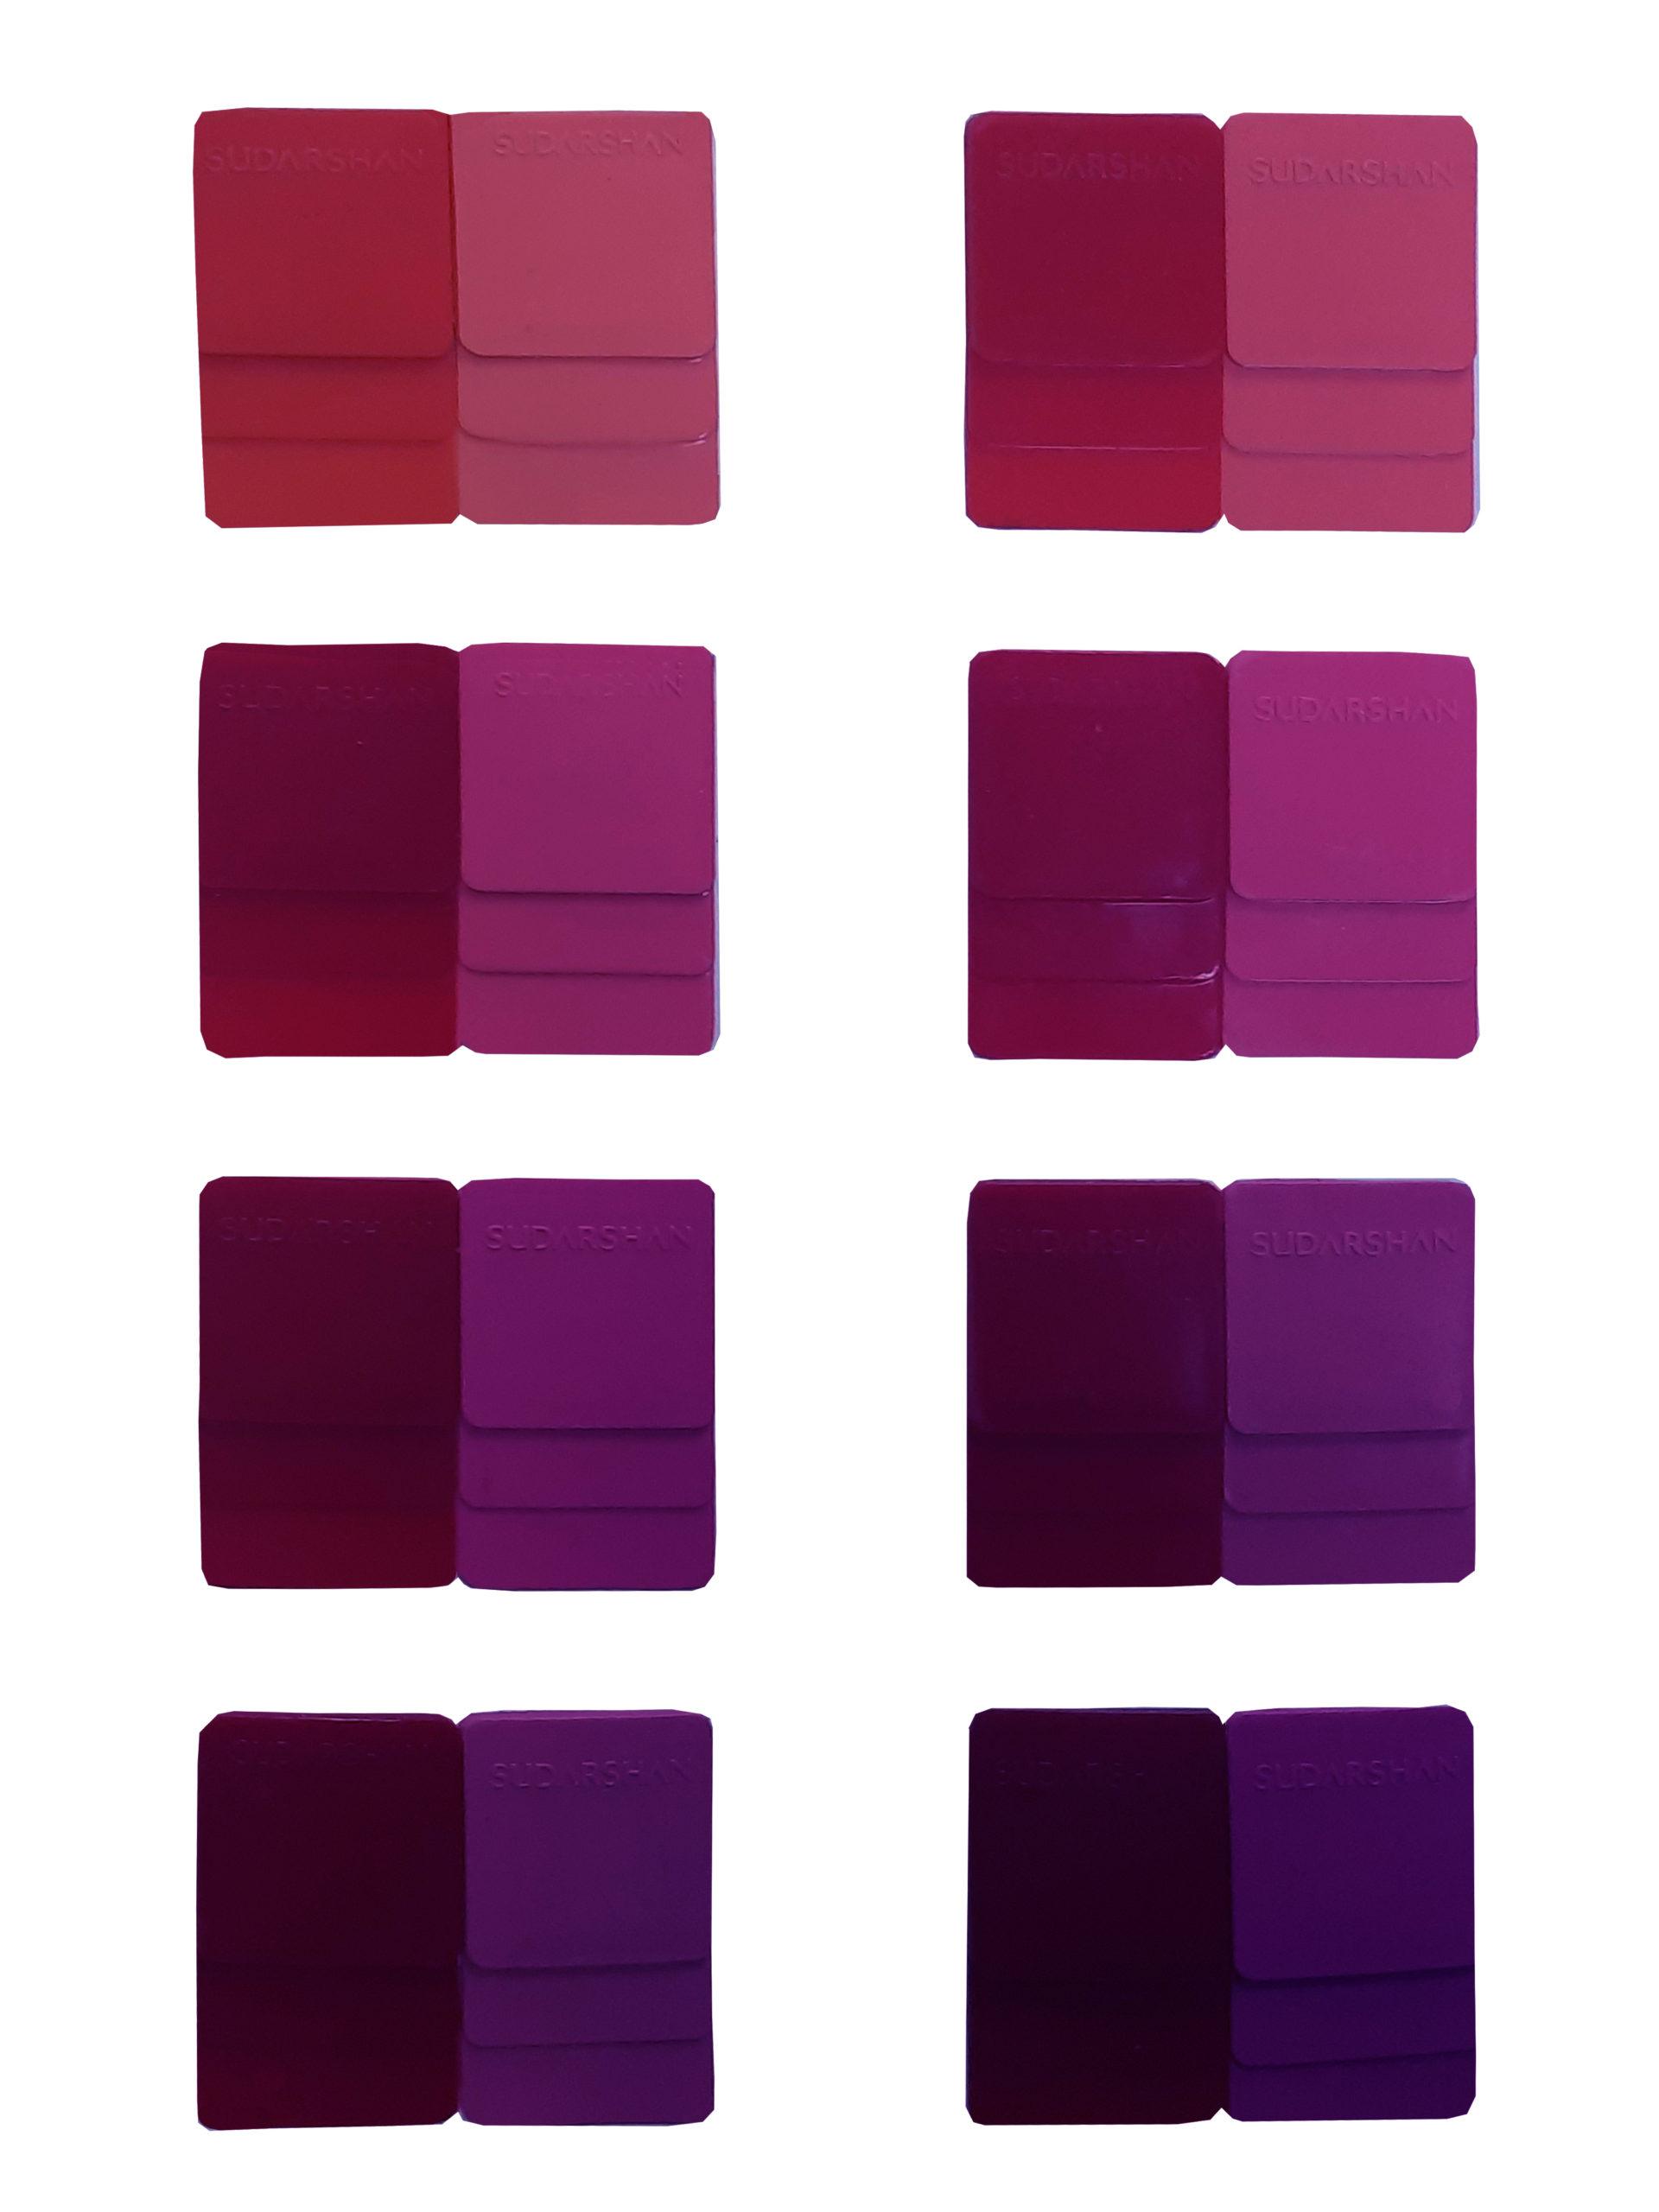 http://denovaspb.ru/wp-content/uploads/2021/04/Obrazcy_violet-scaled.jpg